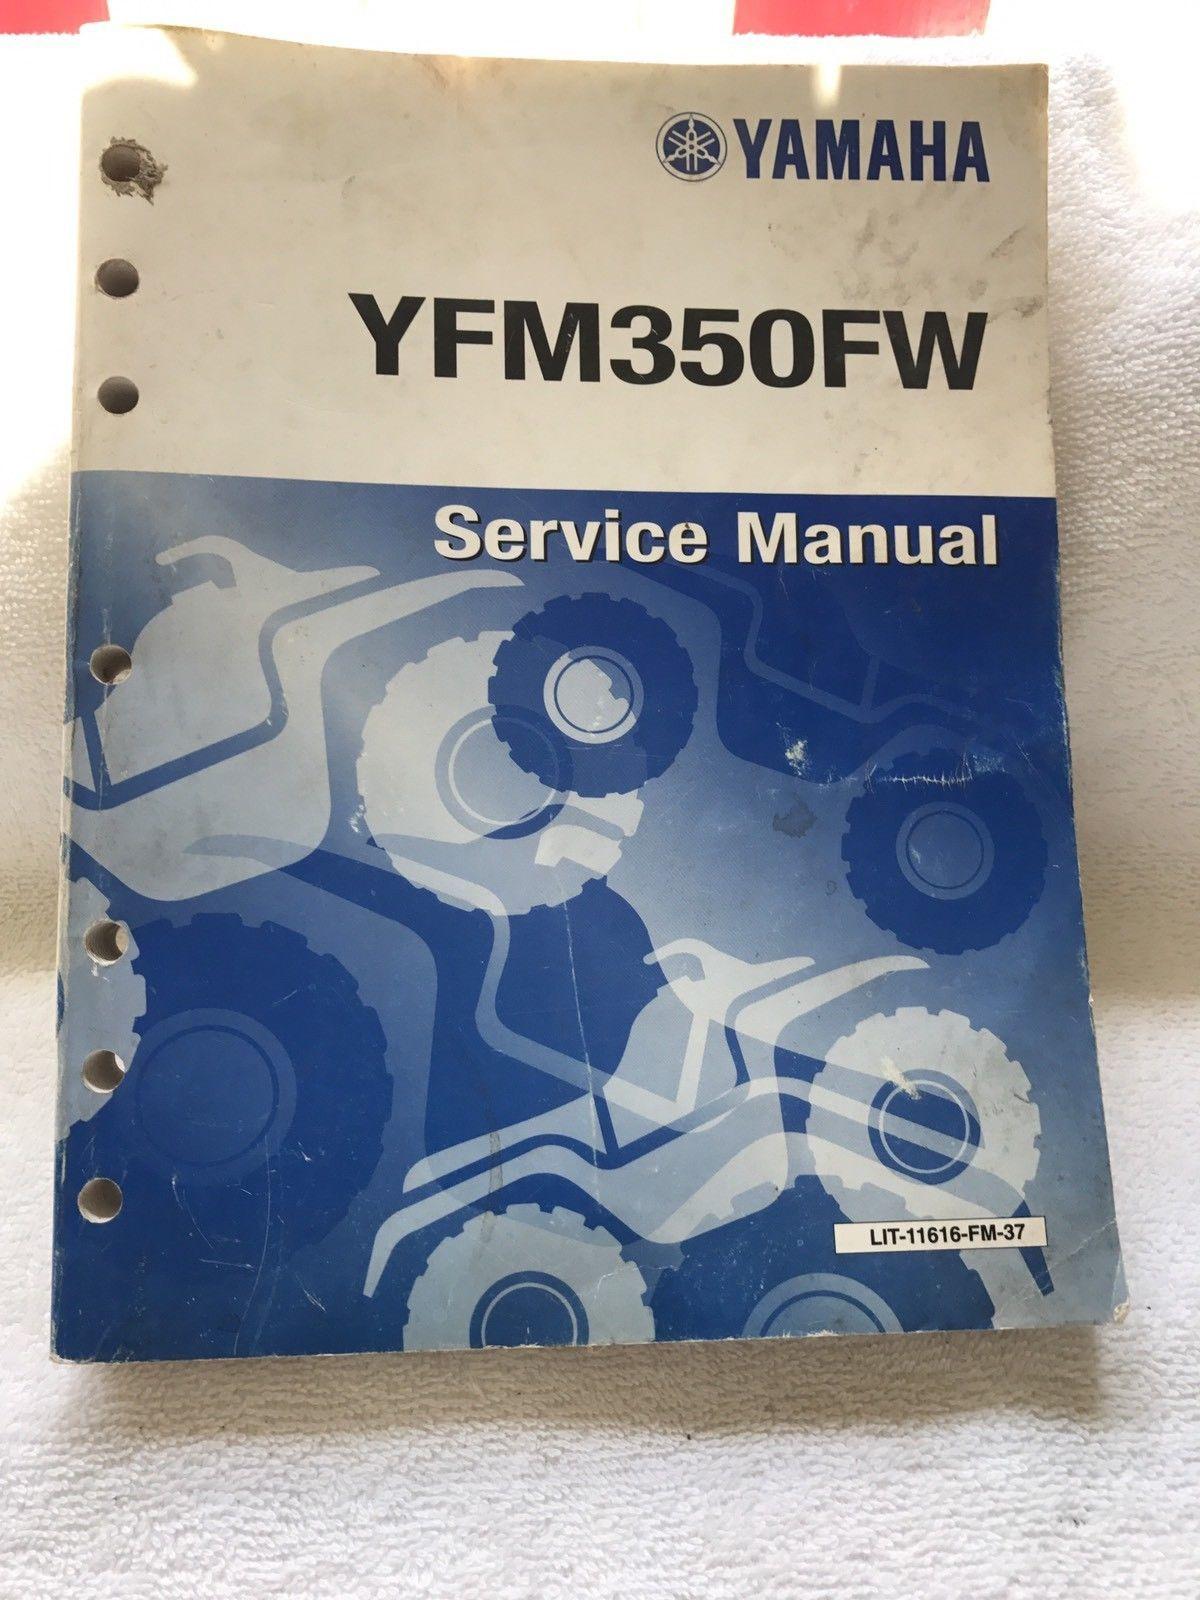 Yamaha YFM350FW Service Manual Supplementary Manual